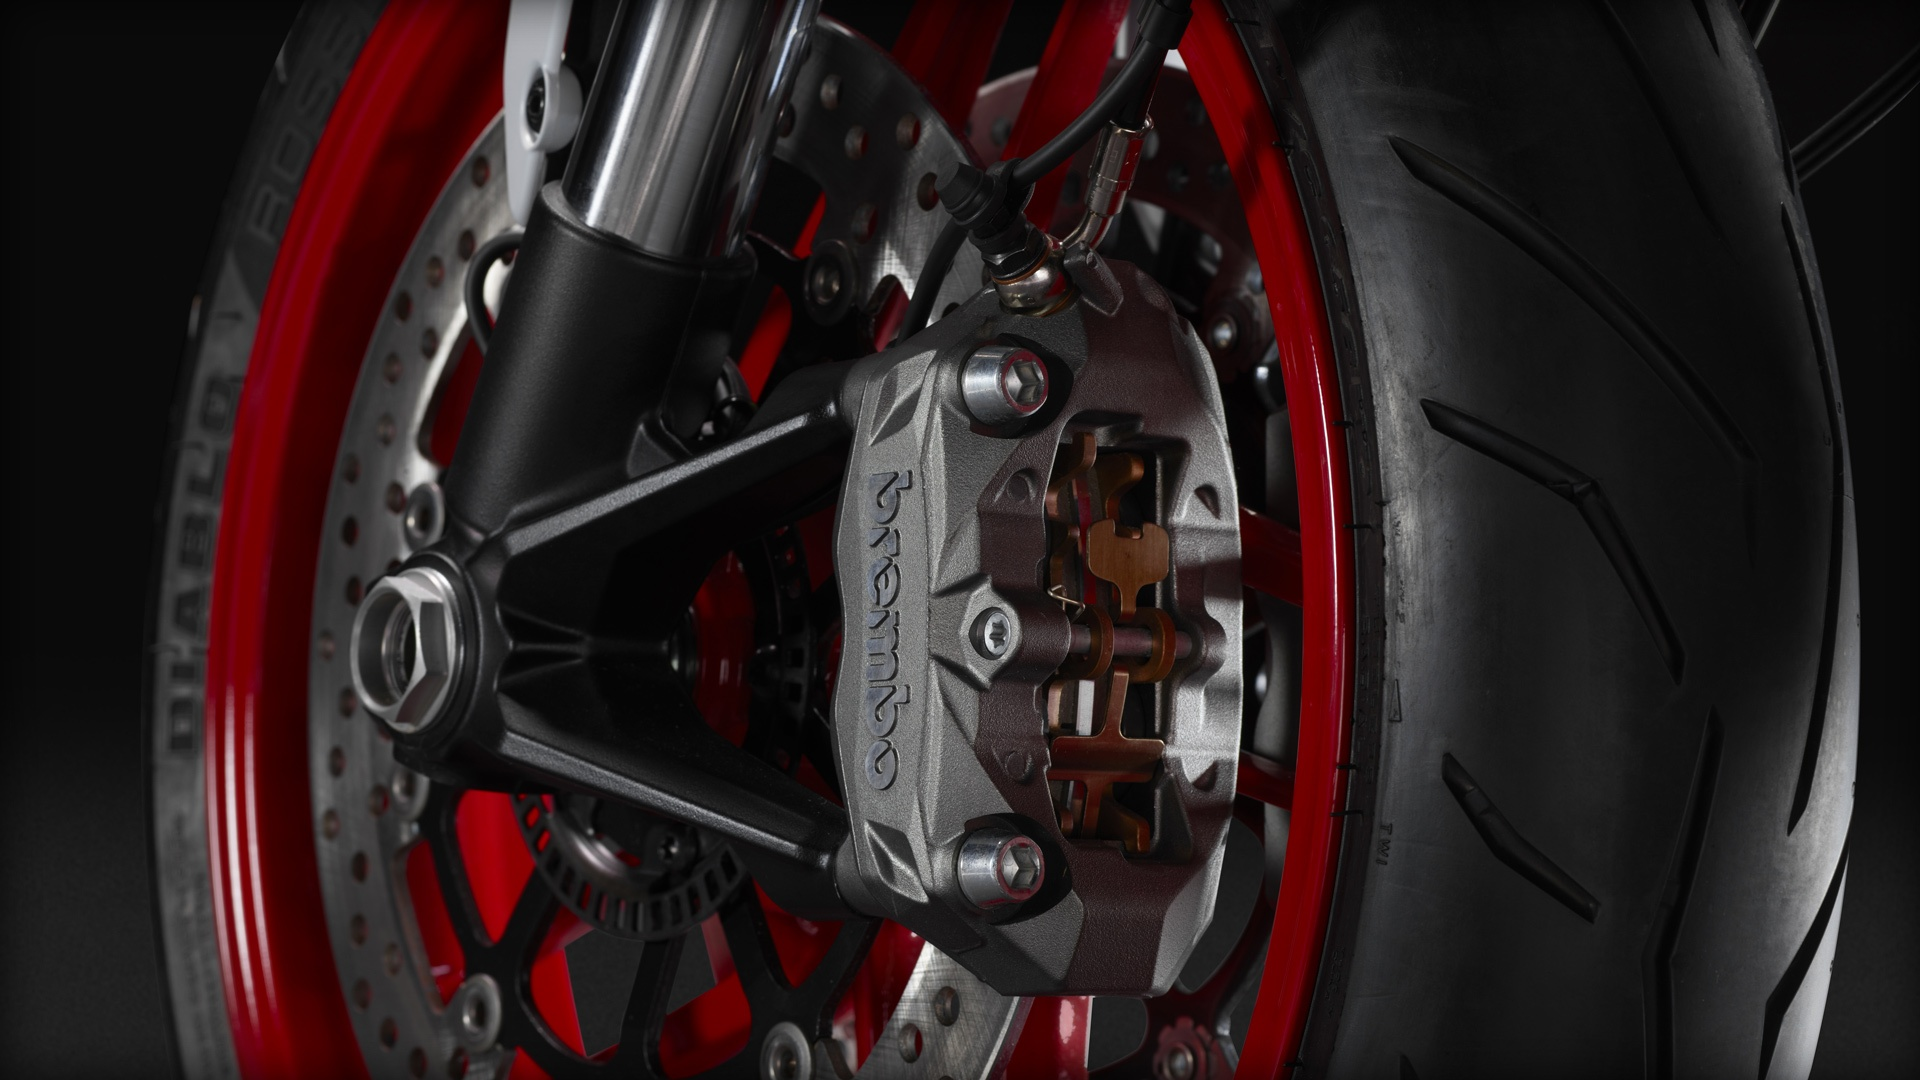 МОТОЦИКЛ DUCATI MONSTER 797  Артмото - купить квадроцикл в украине и харькове, мотоцикл, снегоход, скутер, мопед, электромобиль